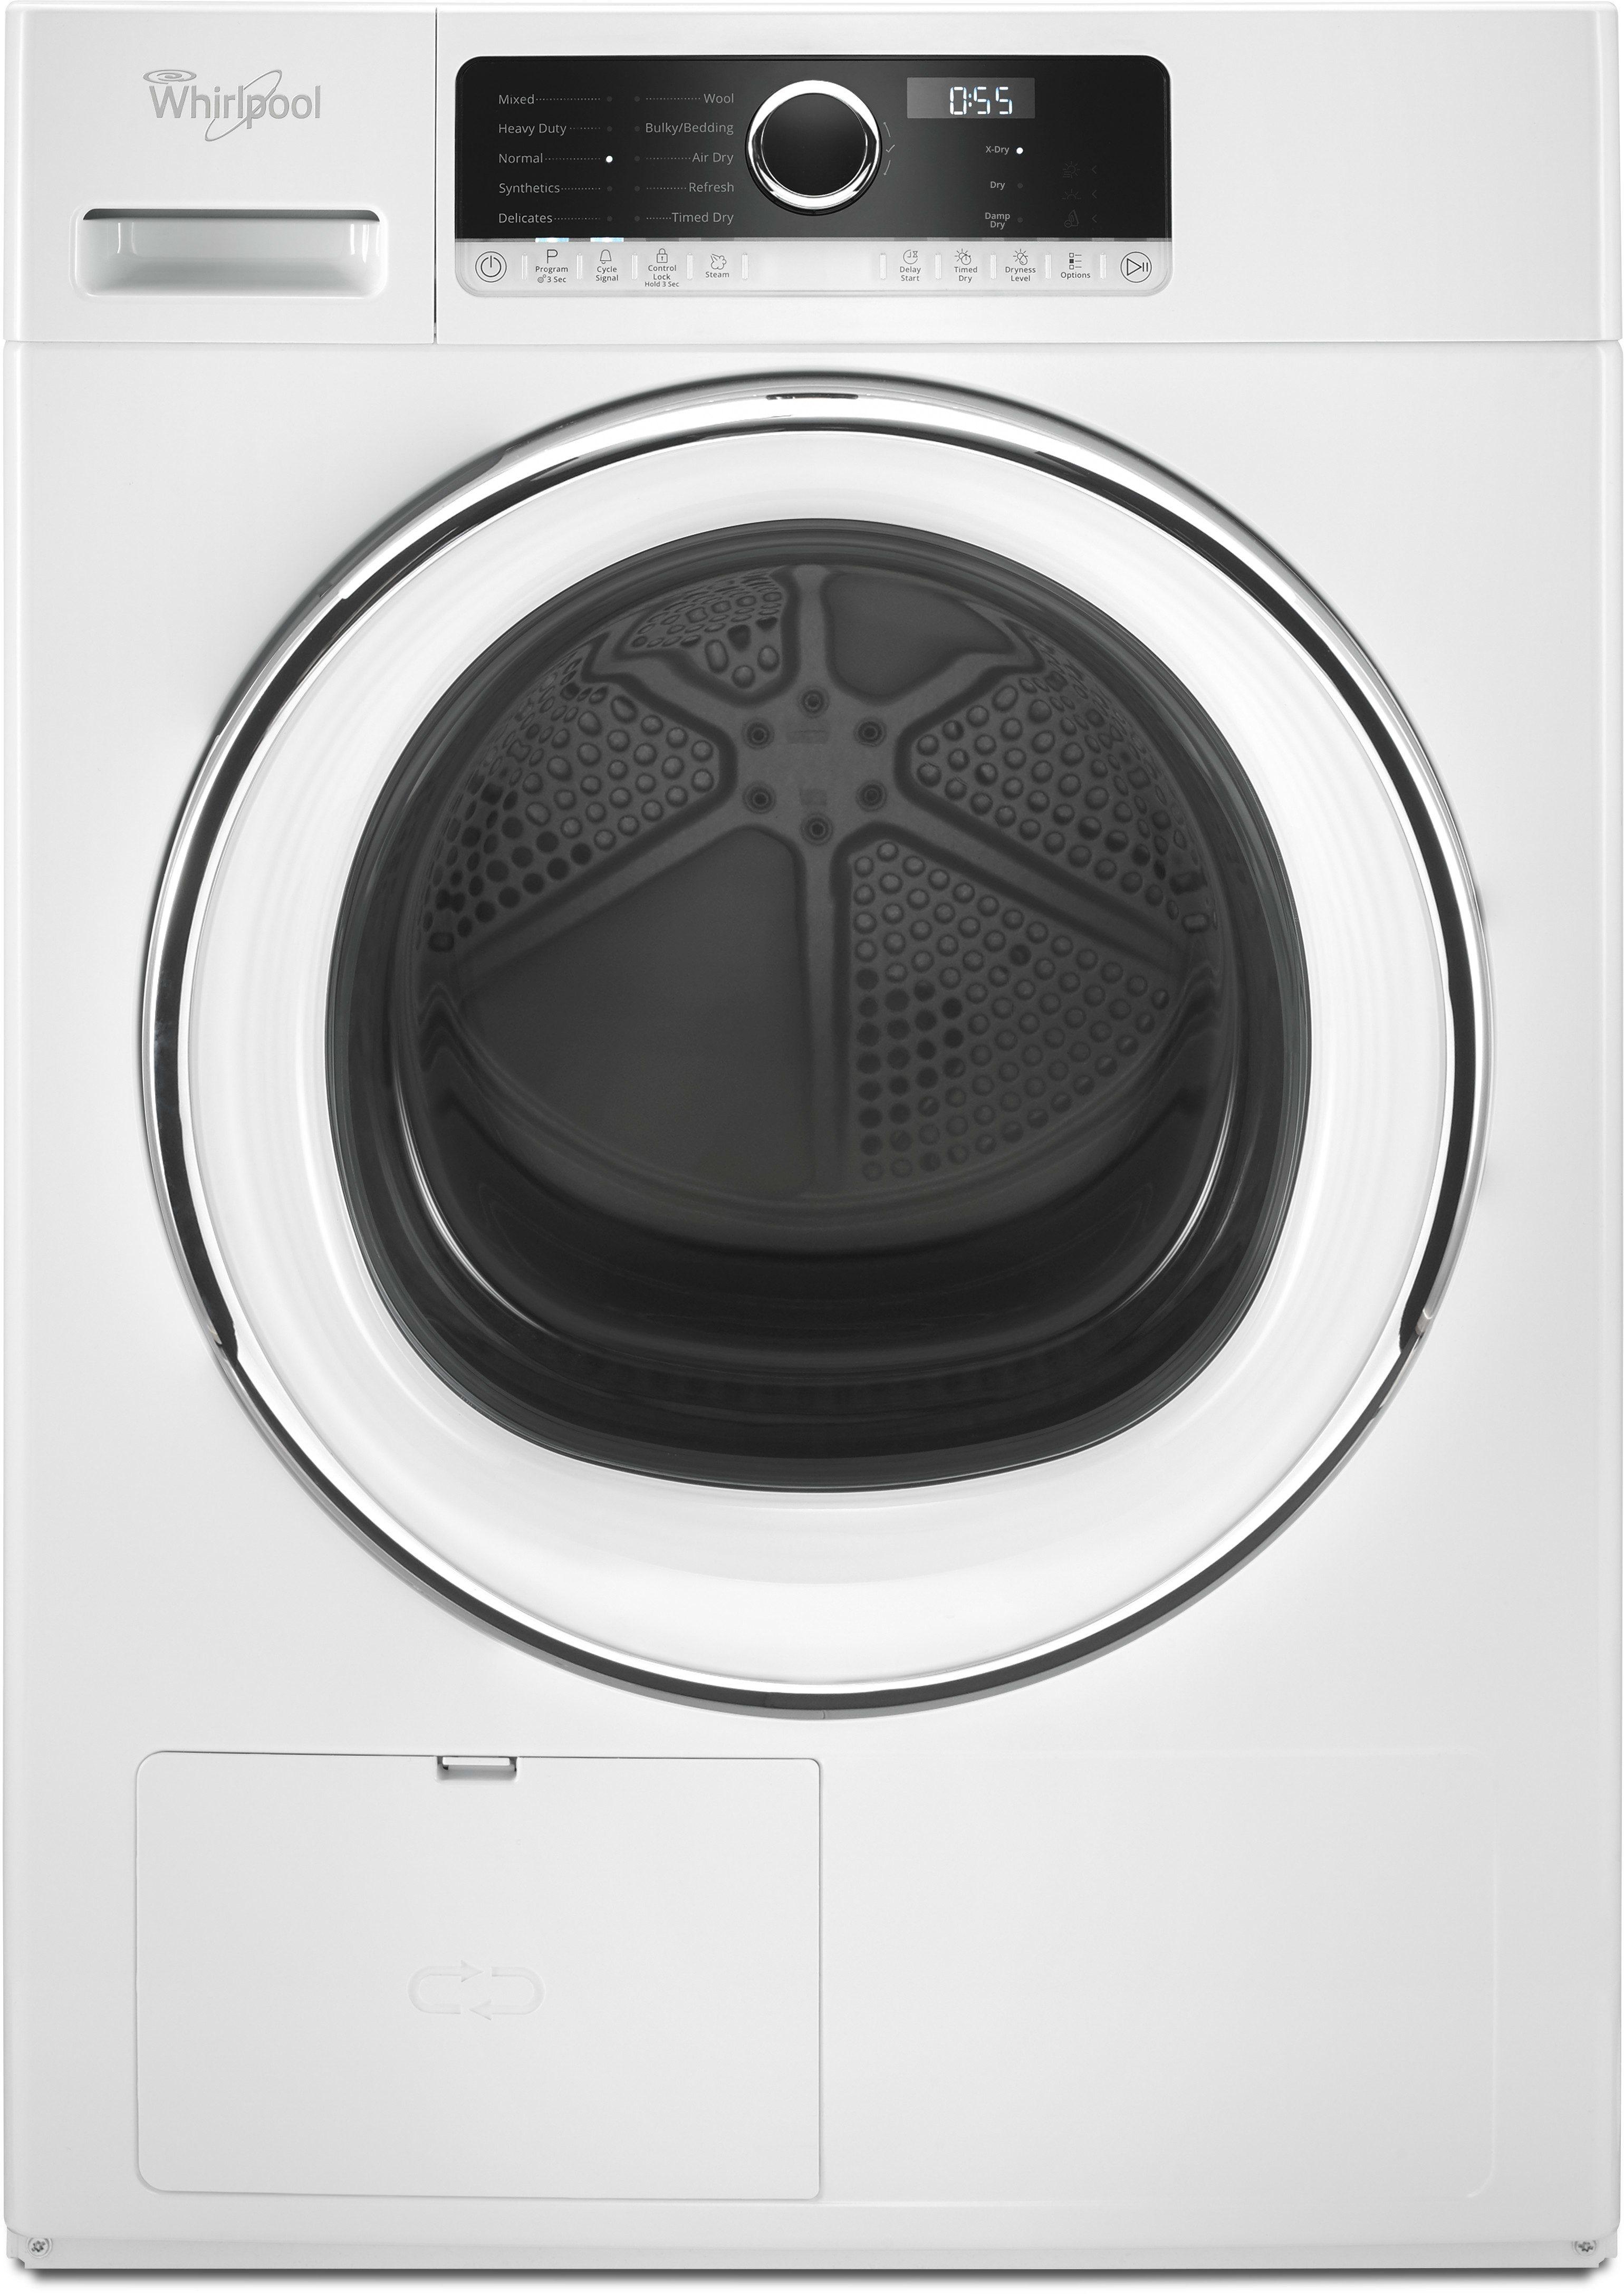 Whirlpool Whd5090gw 24 Inch 4 3 Cu Ft True Ventless Heat